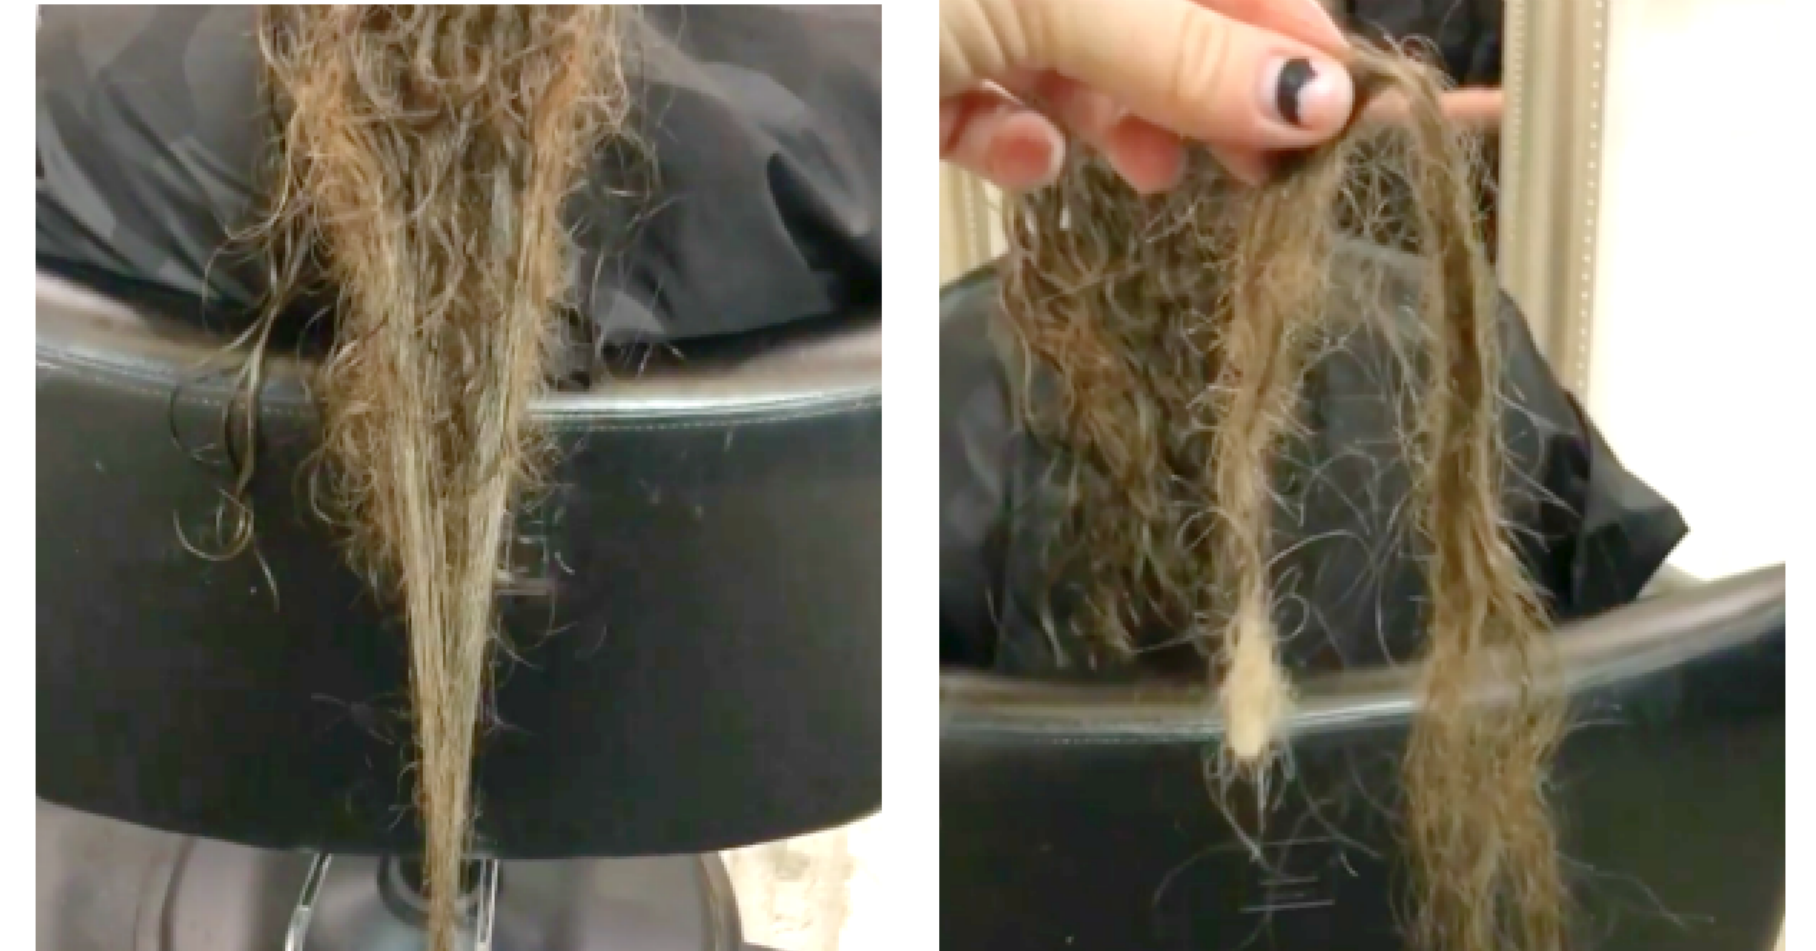 This Mom's Video Of Her Postpartum Hair Loss Has Instagram Shook